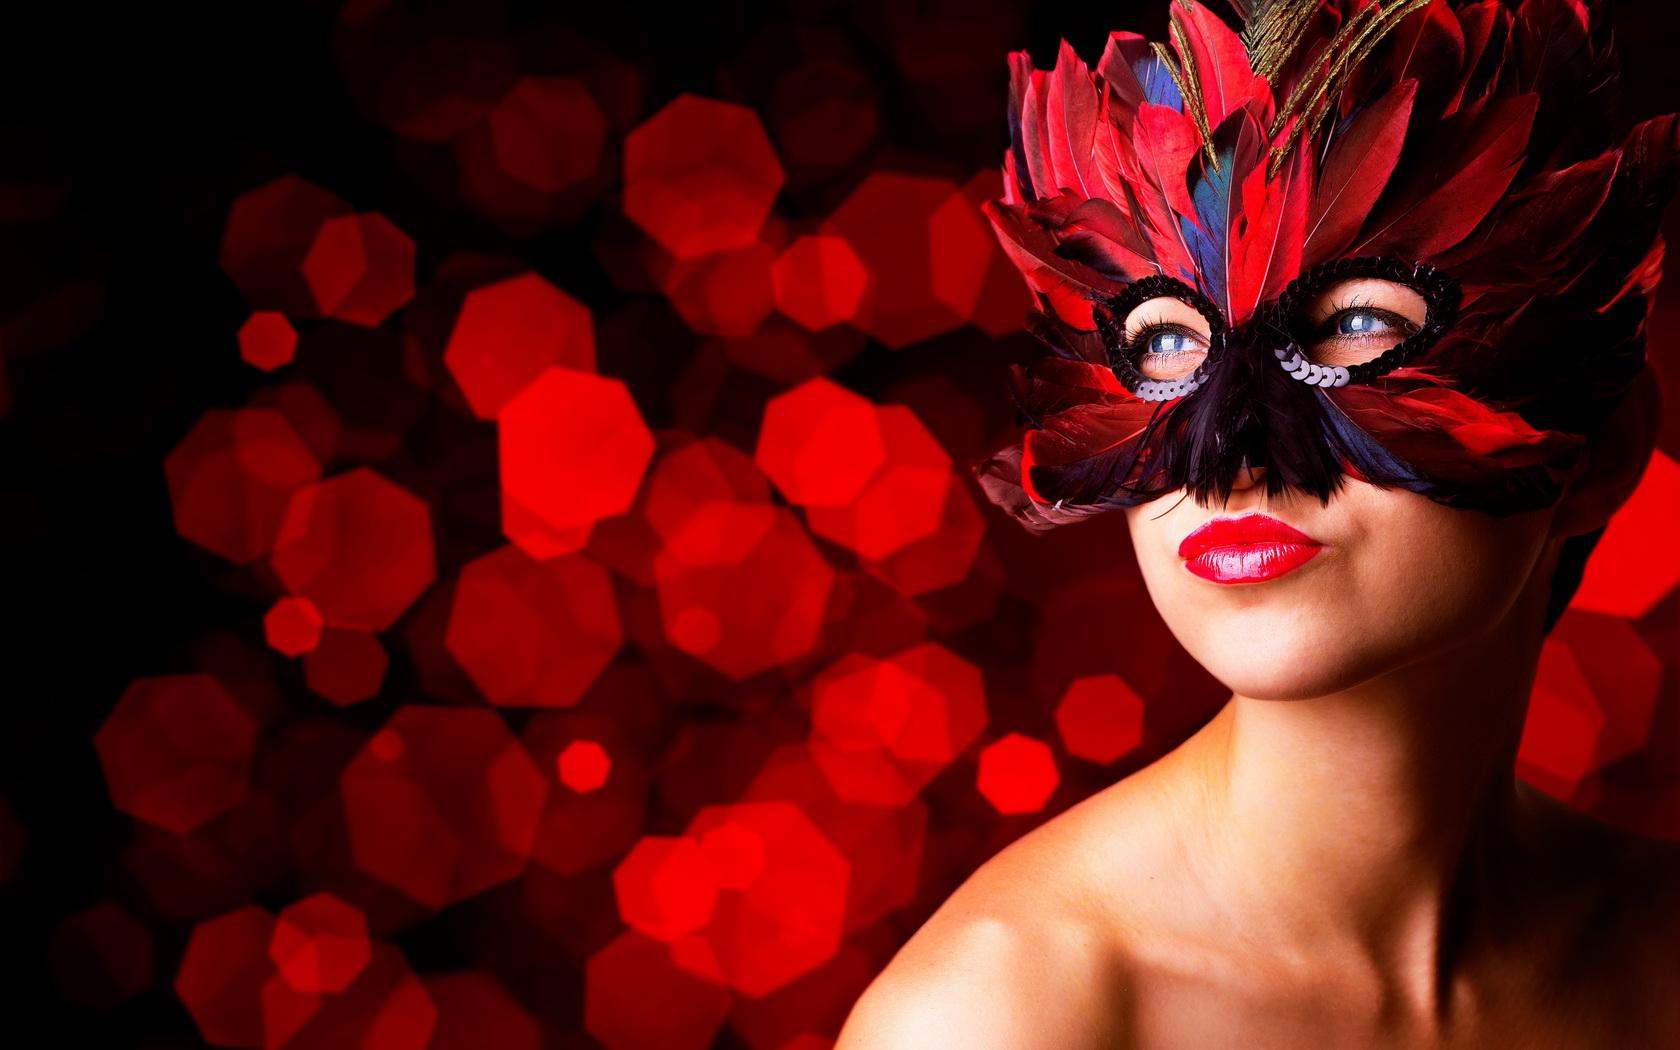 Wallpaper 1680x1050 Girl Girl Woman Beauty Mask Red Blue Eyes Wallpaper 1680x1050